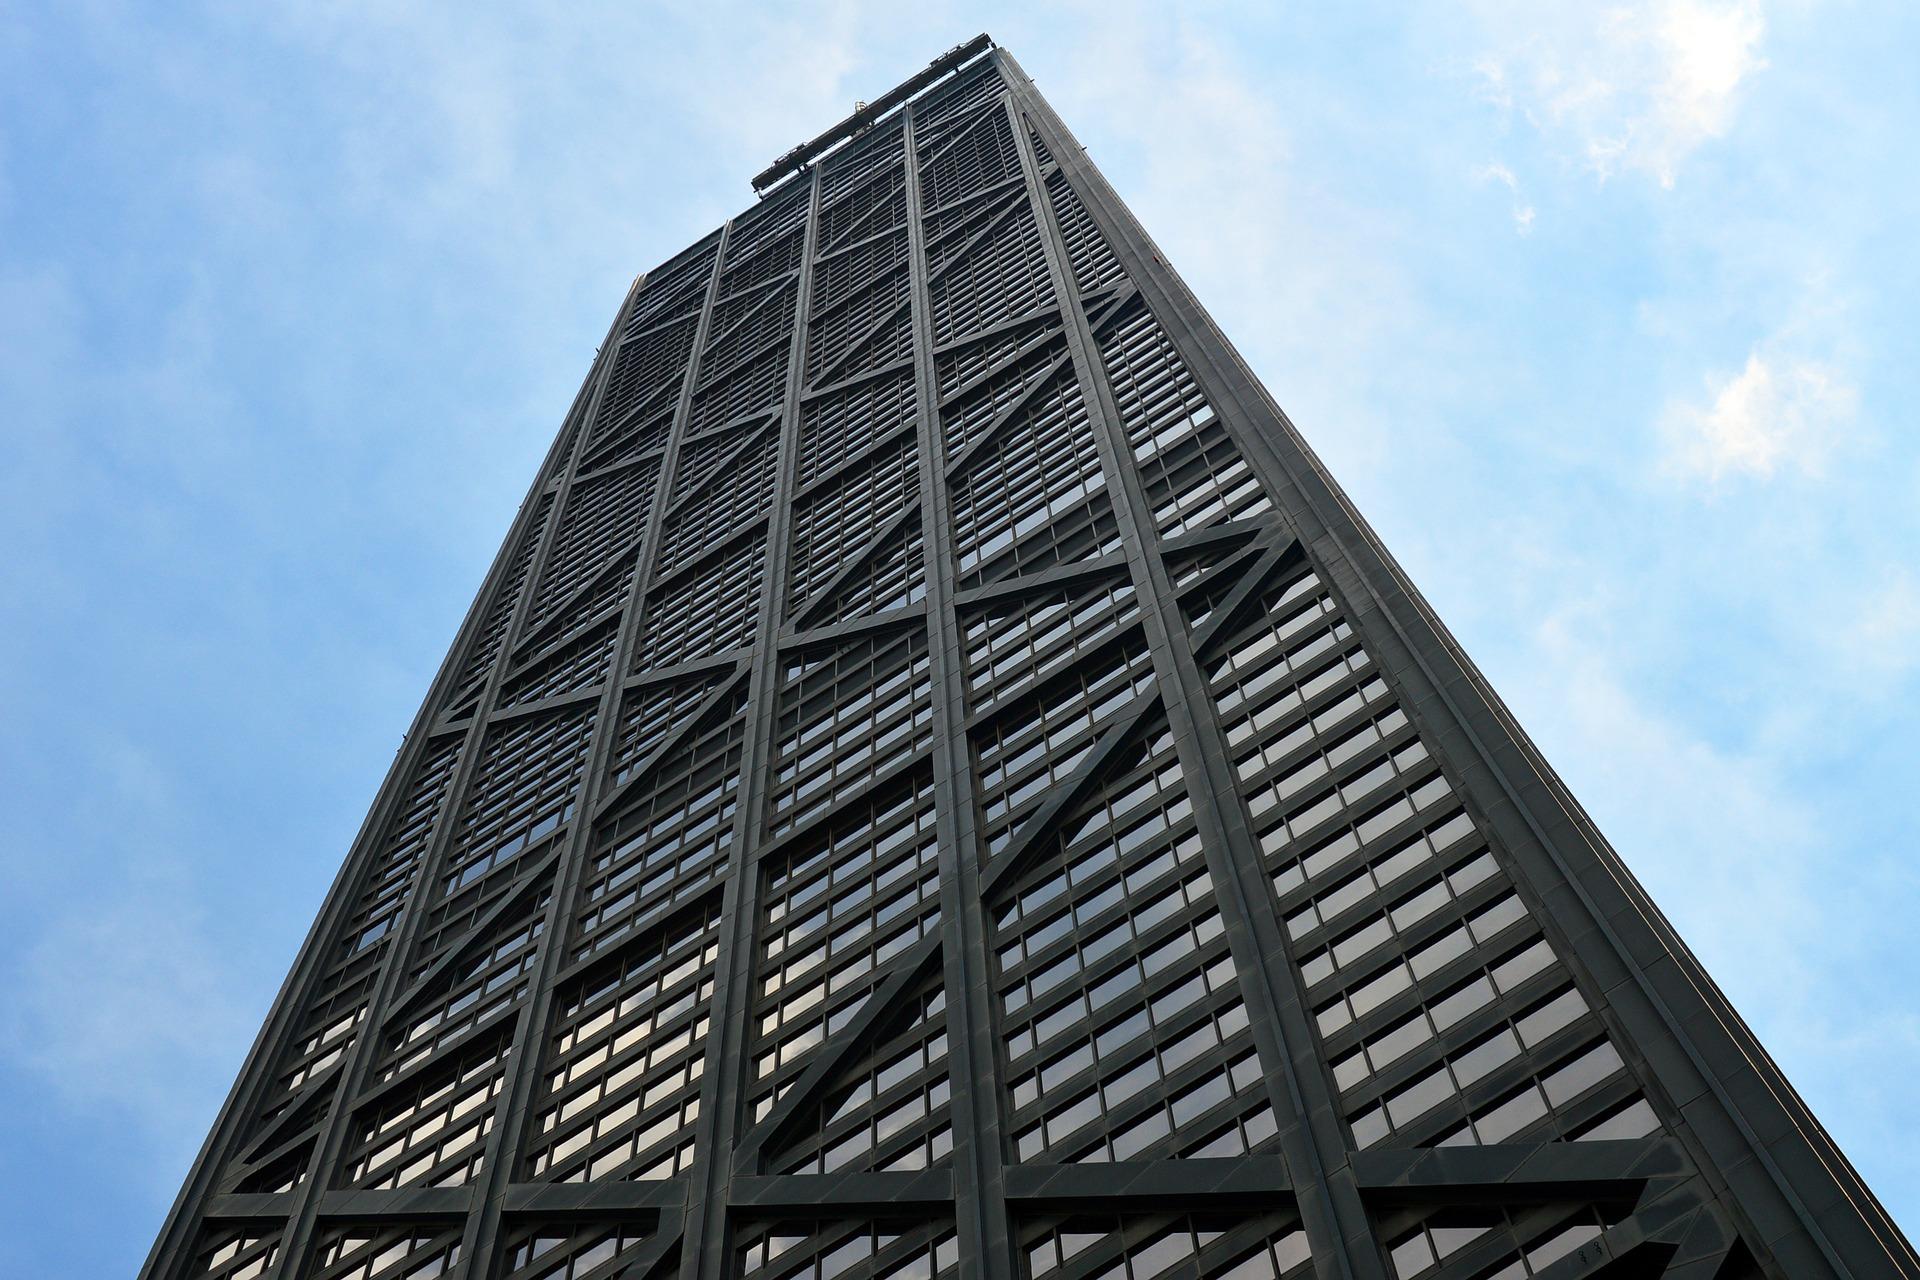 Hancock Center in Chicago